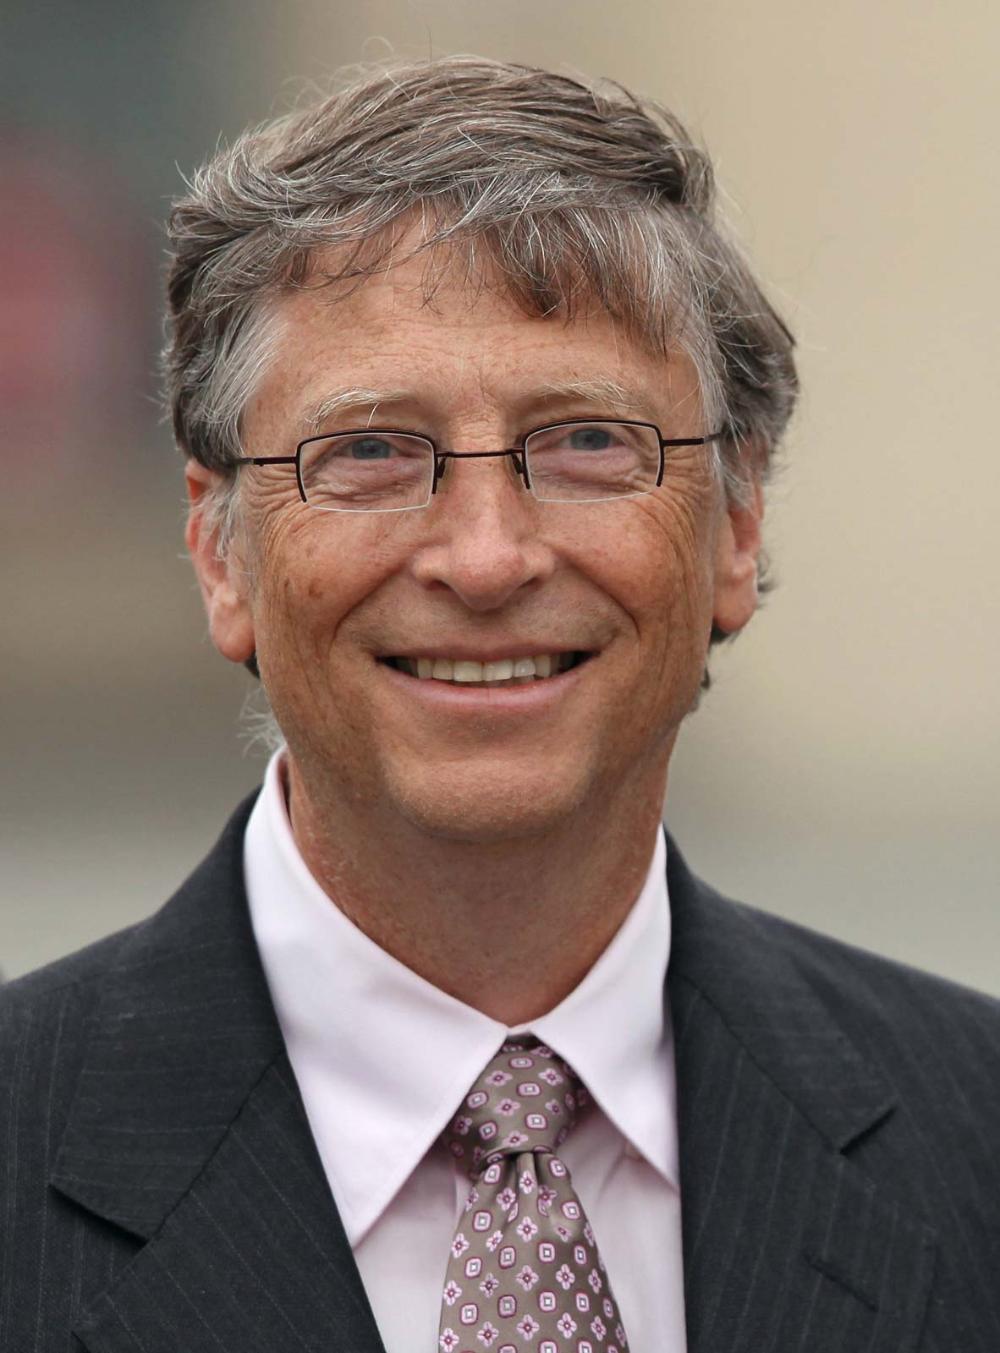 Bill Gates Biography Microsoft Facts Bill Gates Biography Bill Gates Inspirational Story